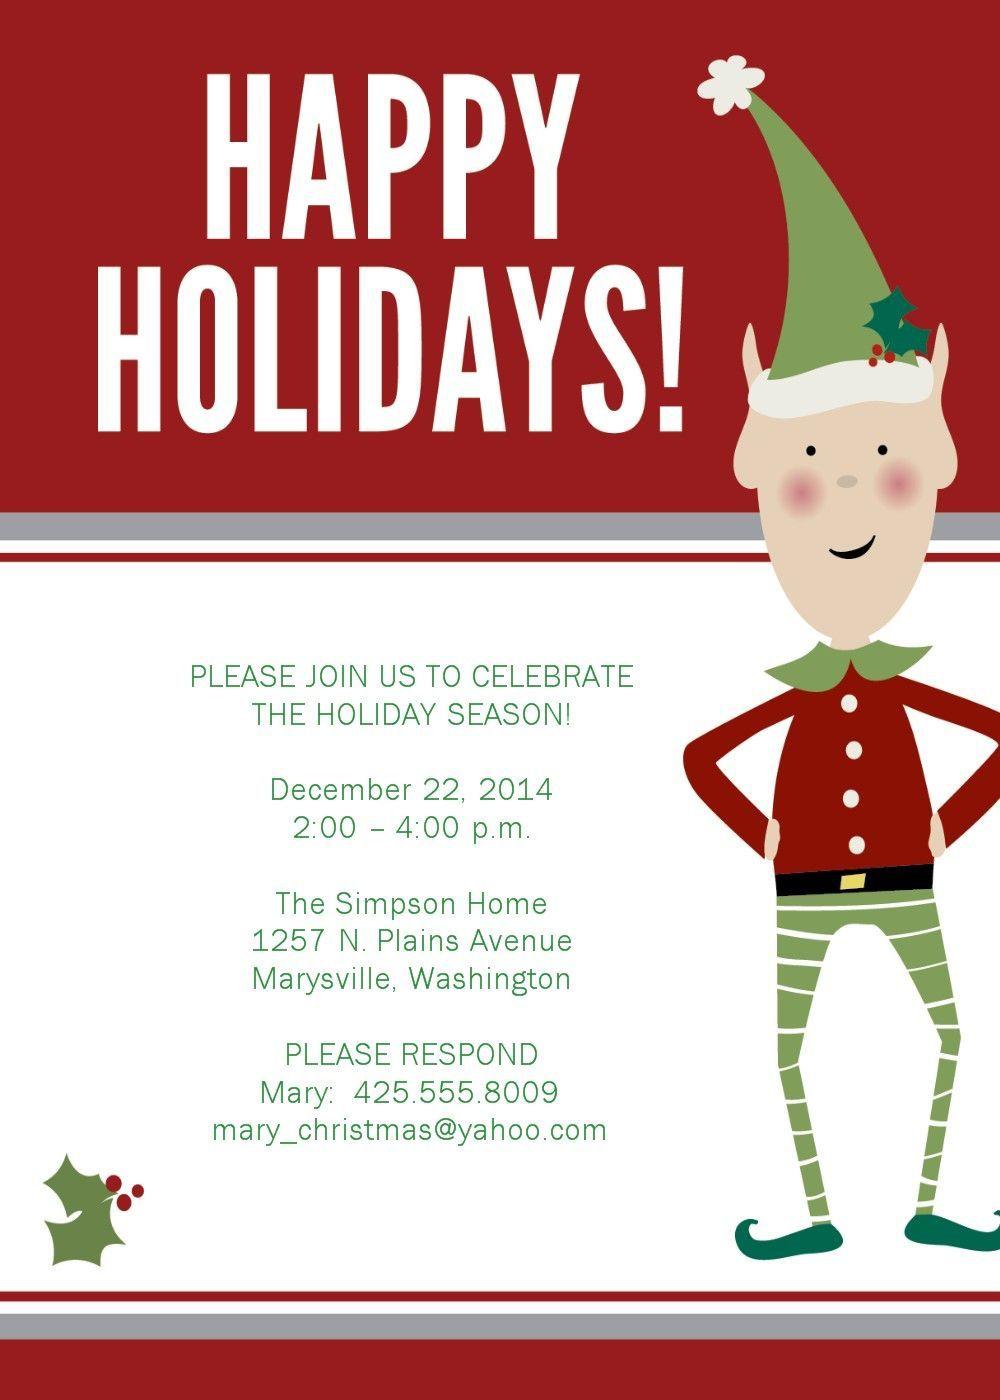 003 Phenomenal Free Email Holiday Party Invitation Template Idea  Templates ChristmaFull